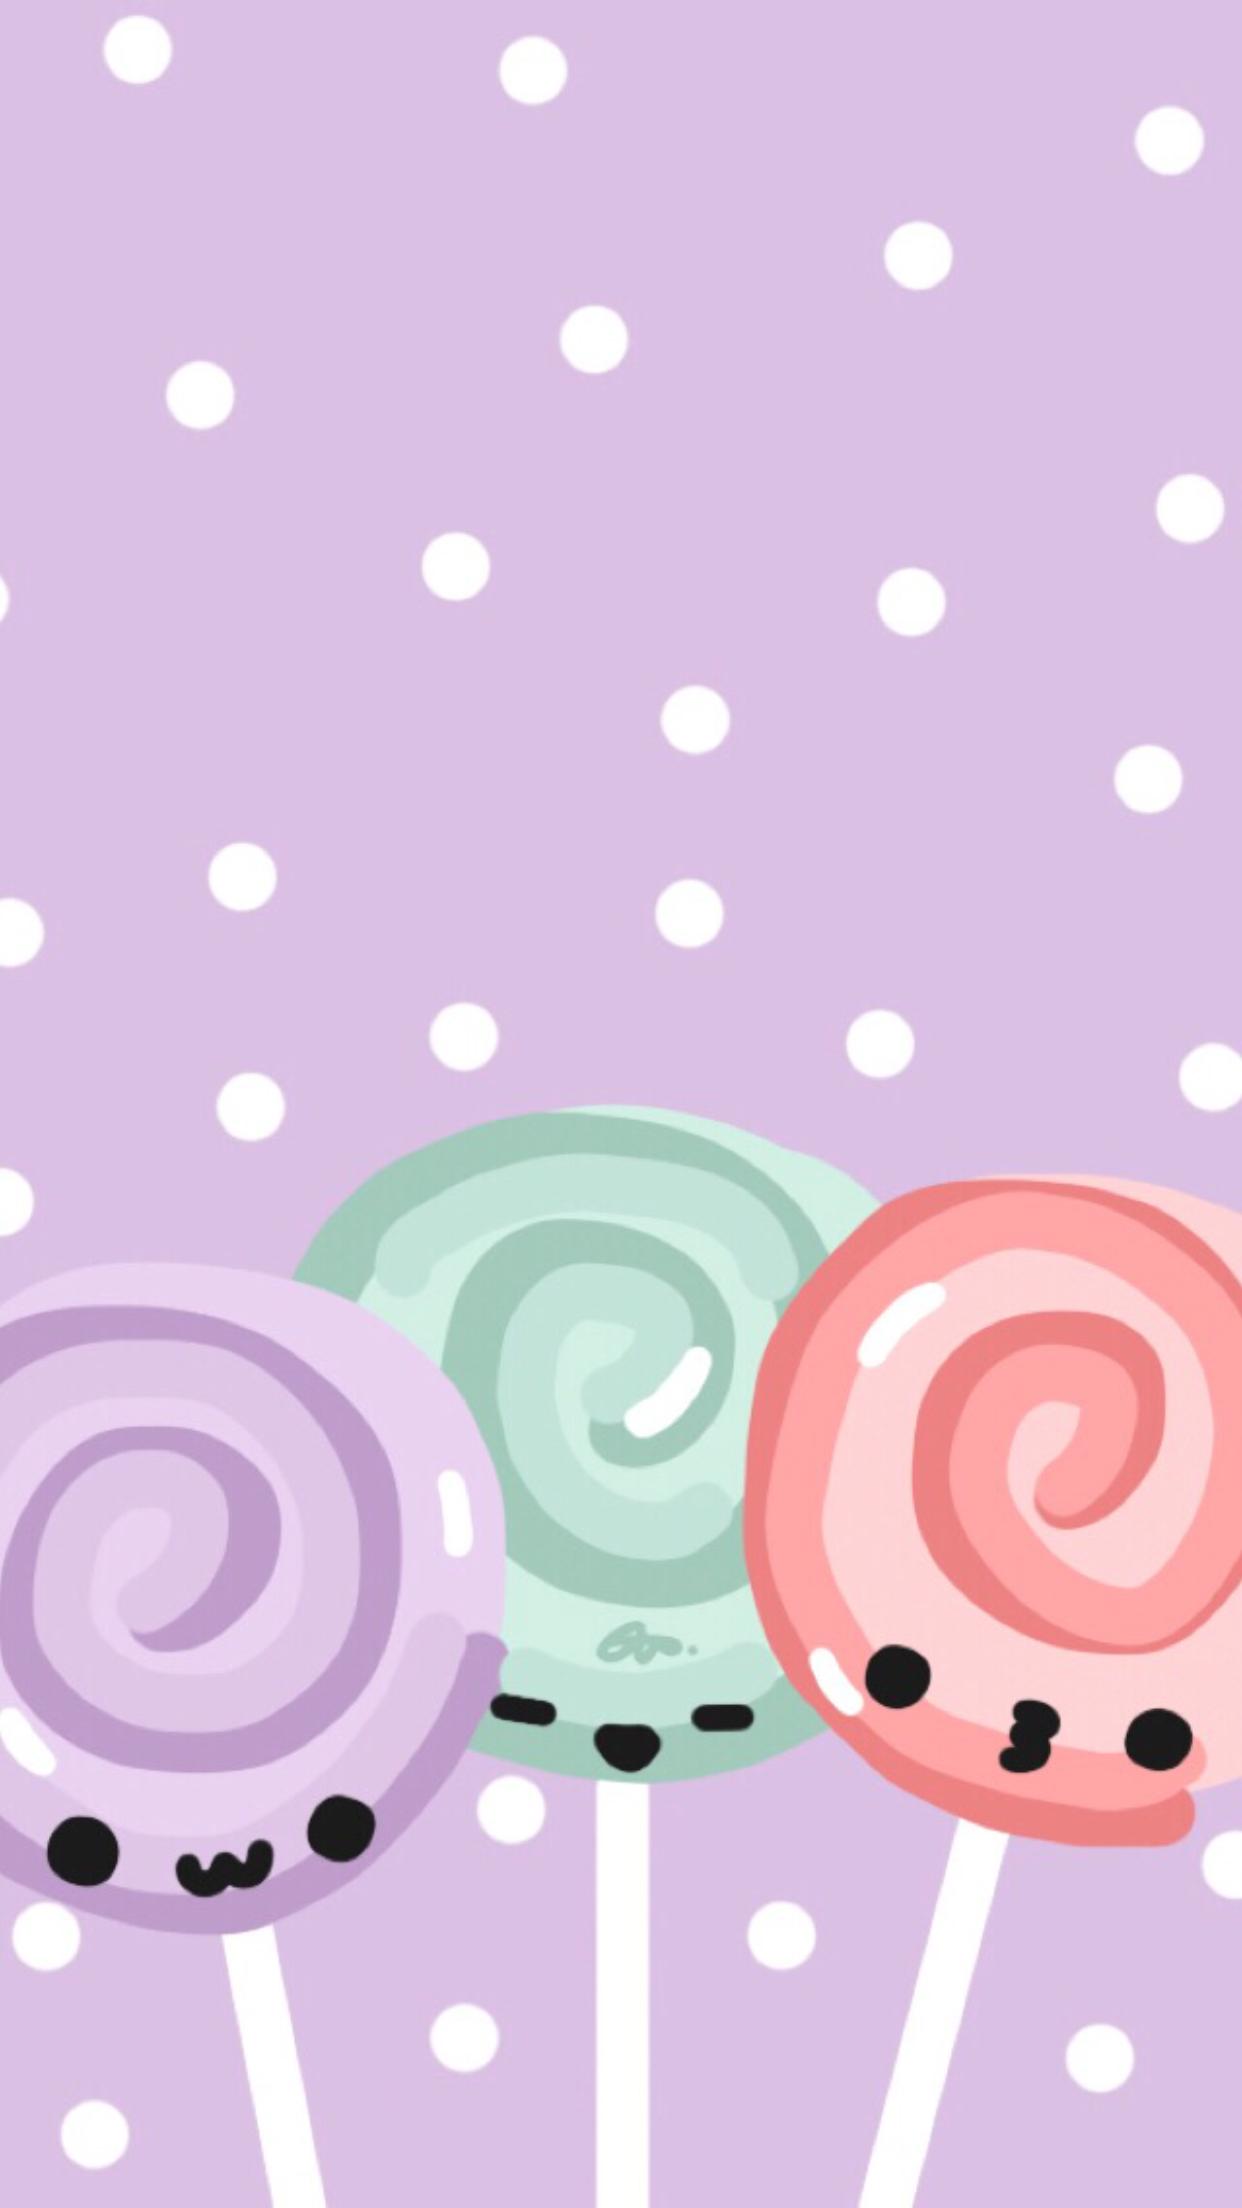 pink wallpaper doodle pattern sweet girly cute